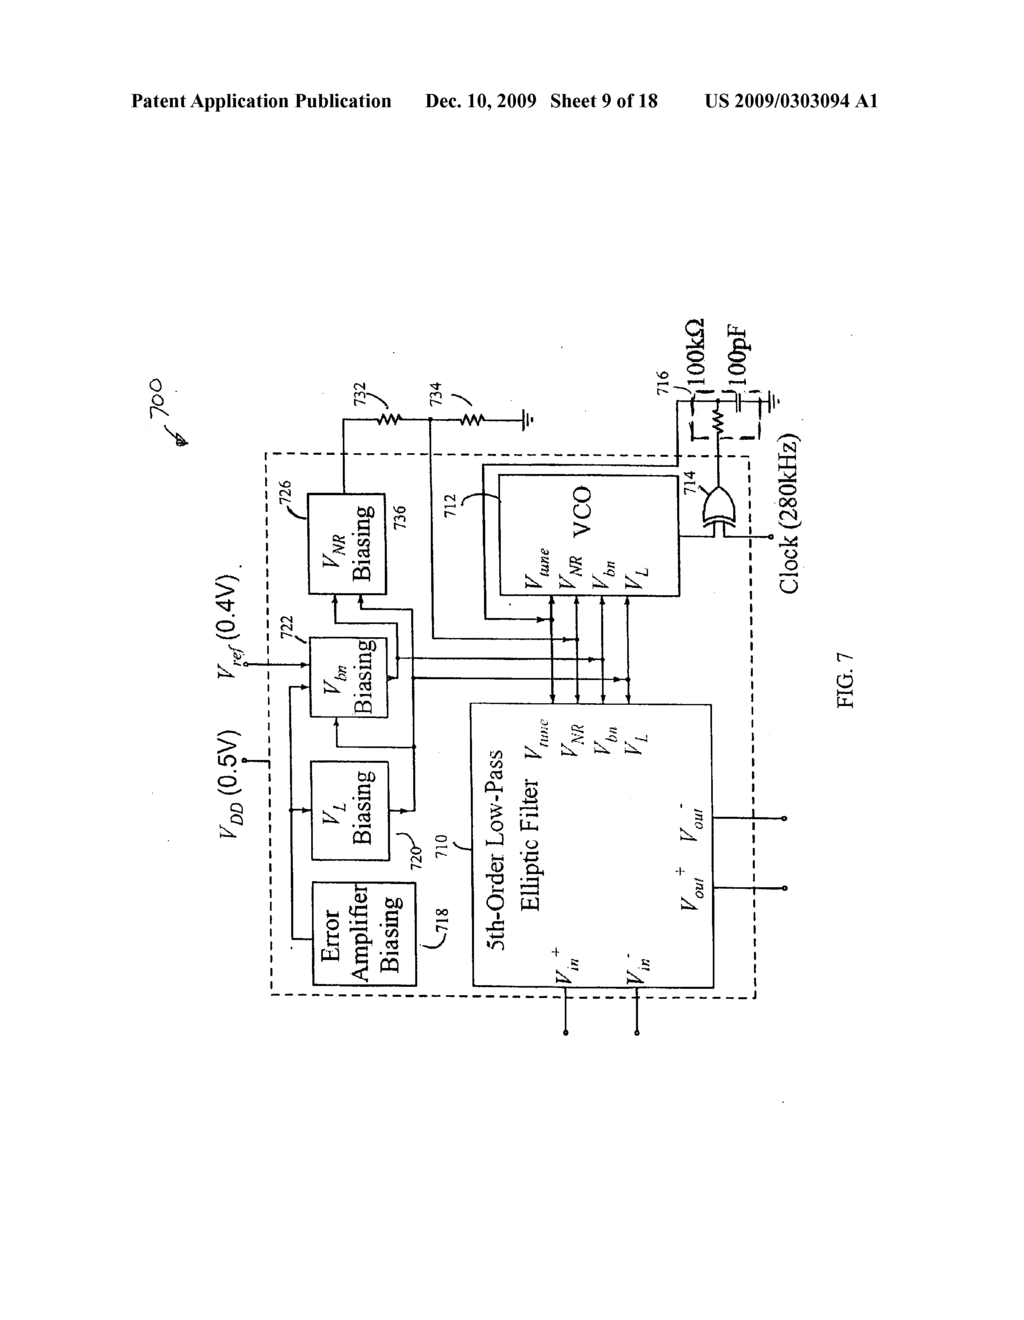 Low Voltage Digital To Analog Converter Comparator And Sigma Delta Circuits Schematic Modulator Diagram Image 10